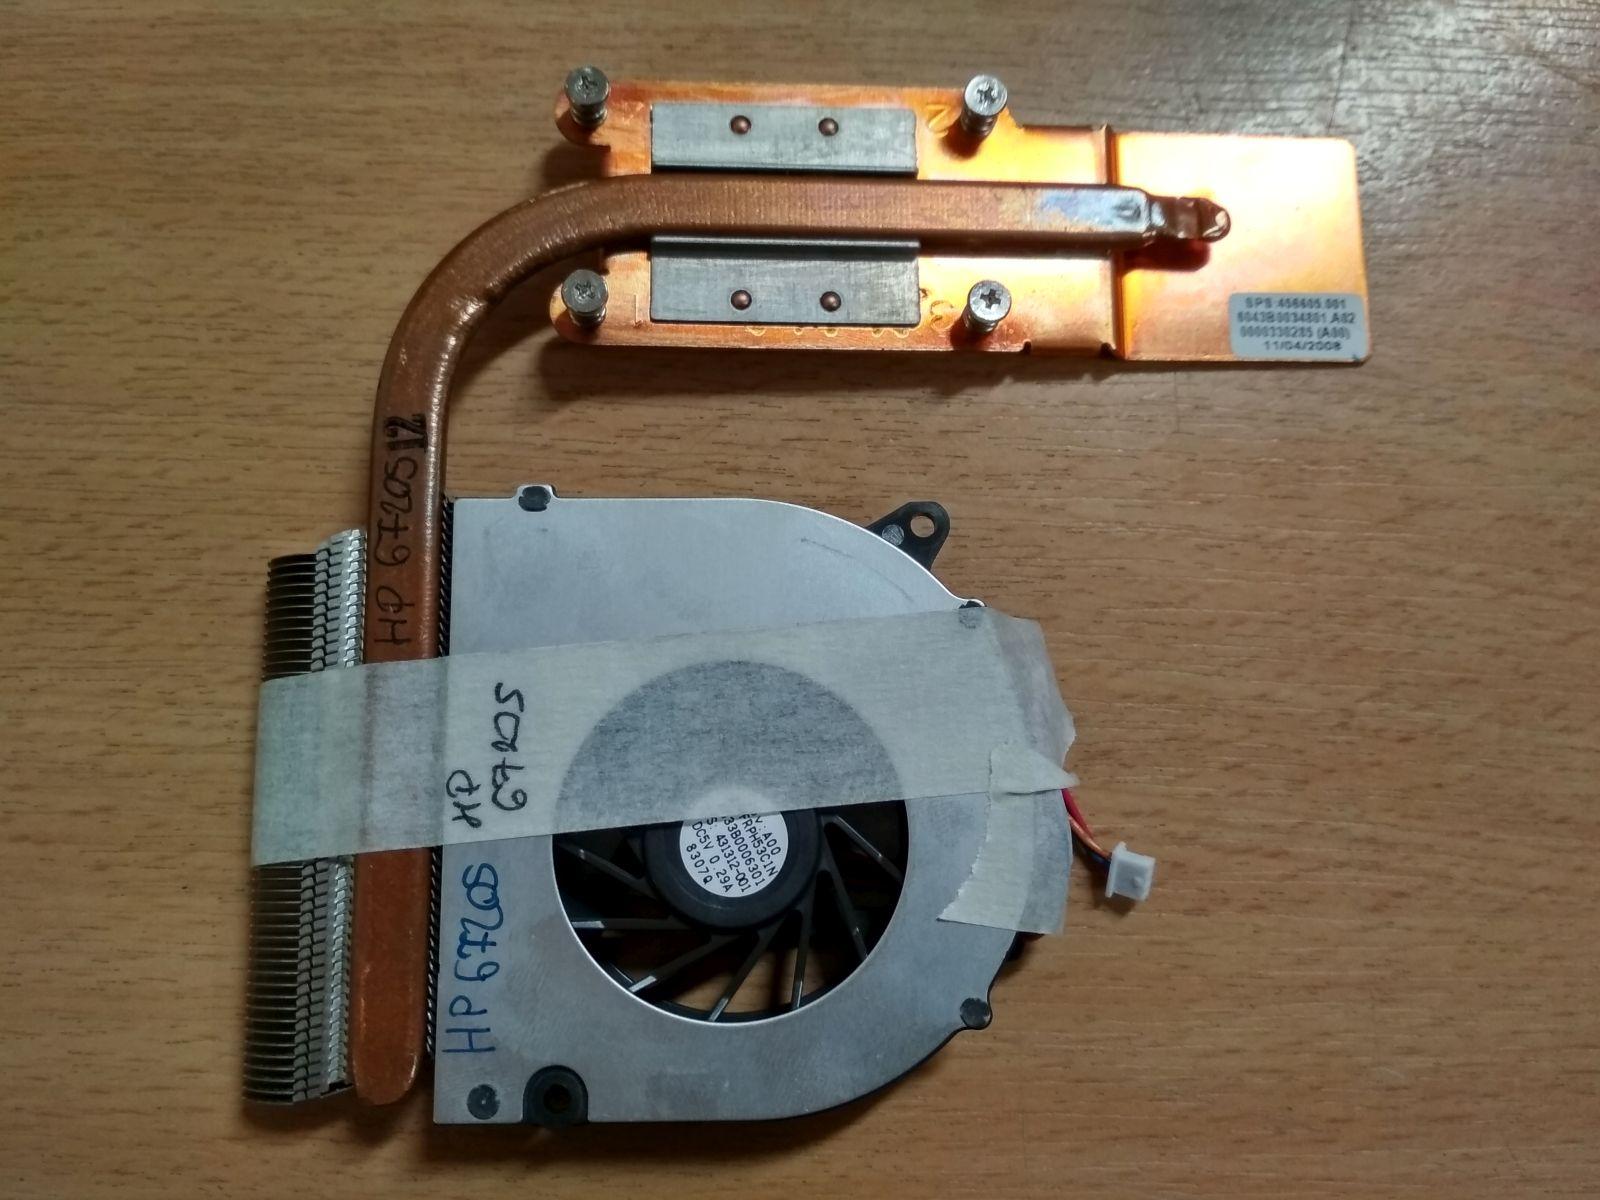 HP Notebook 540 550 6520s 6720s UMA ventilátor 431312-001 + hőcső 456605-001 1 hónap garancia!